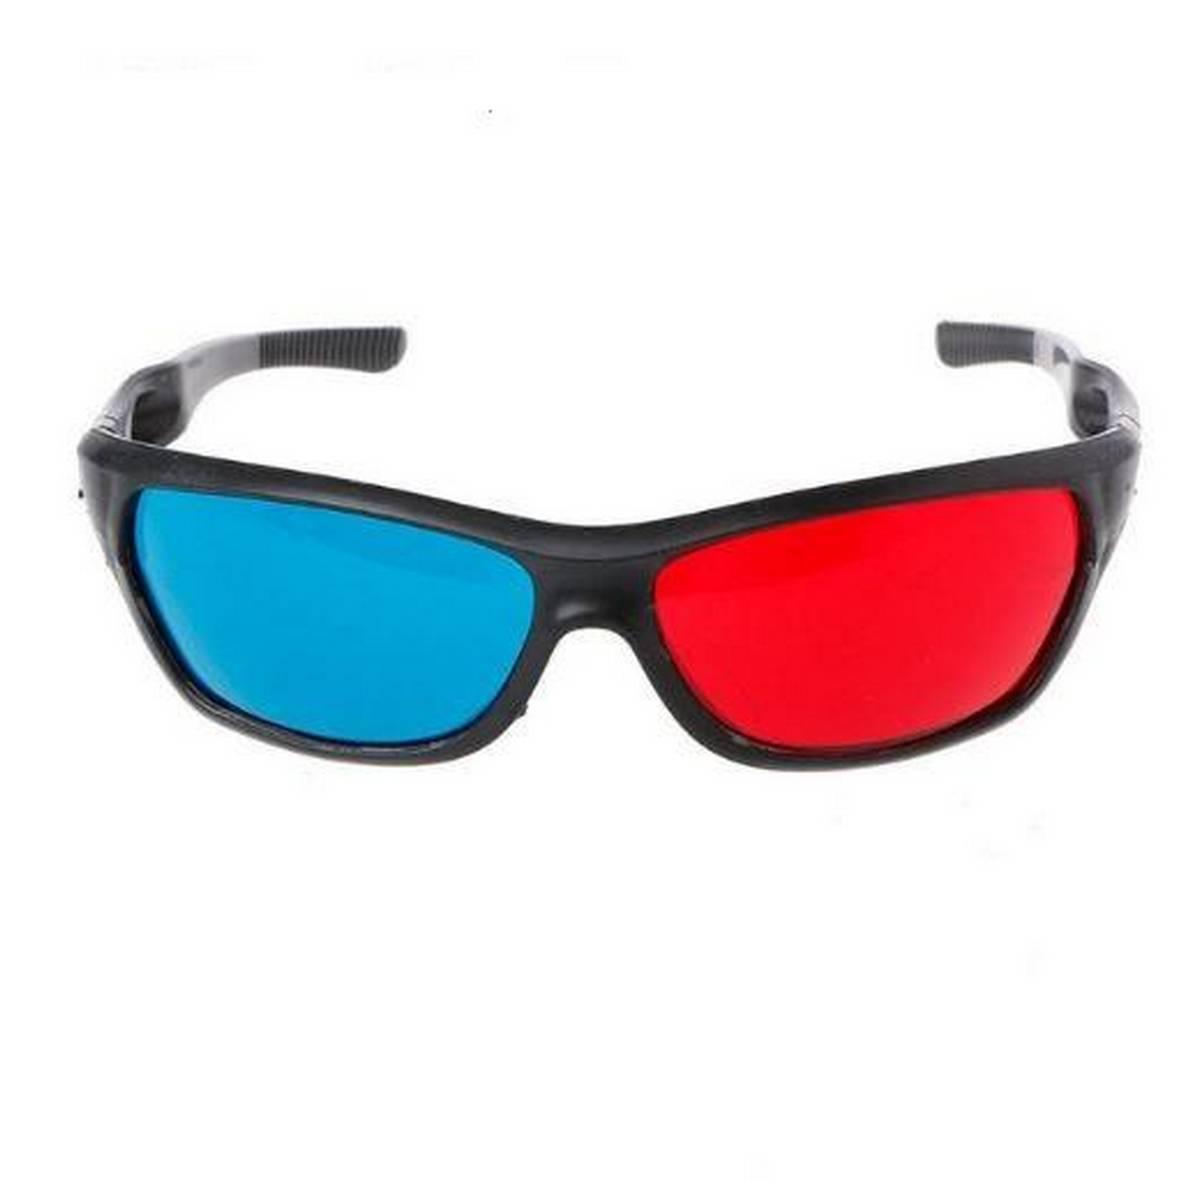 3D Glasses Universal Black Frame Red Blue Anaglyph 3D Glasses For Movie Game DVD Video TV